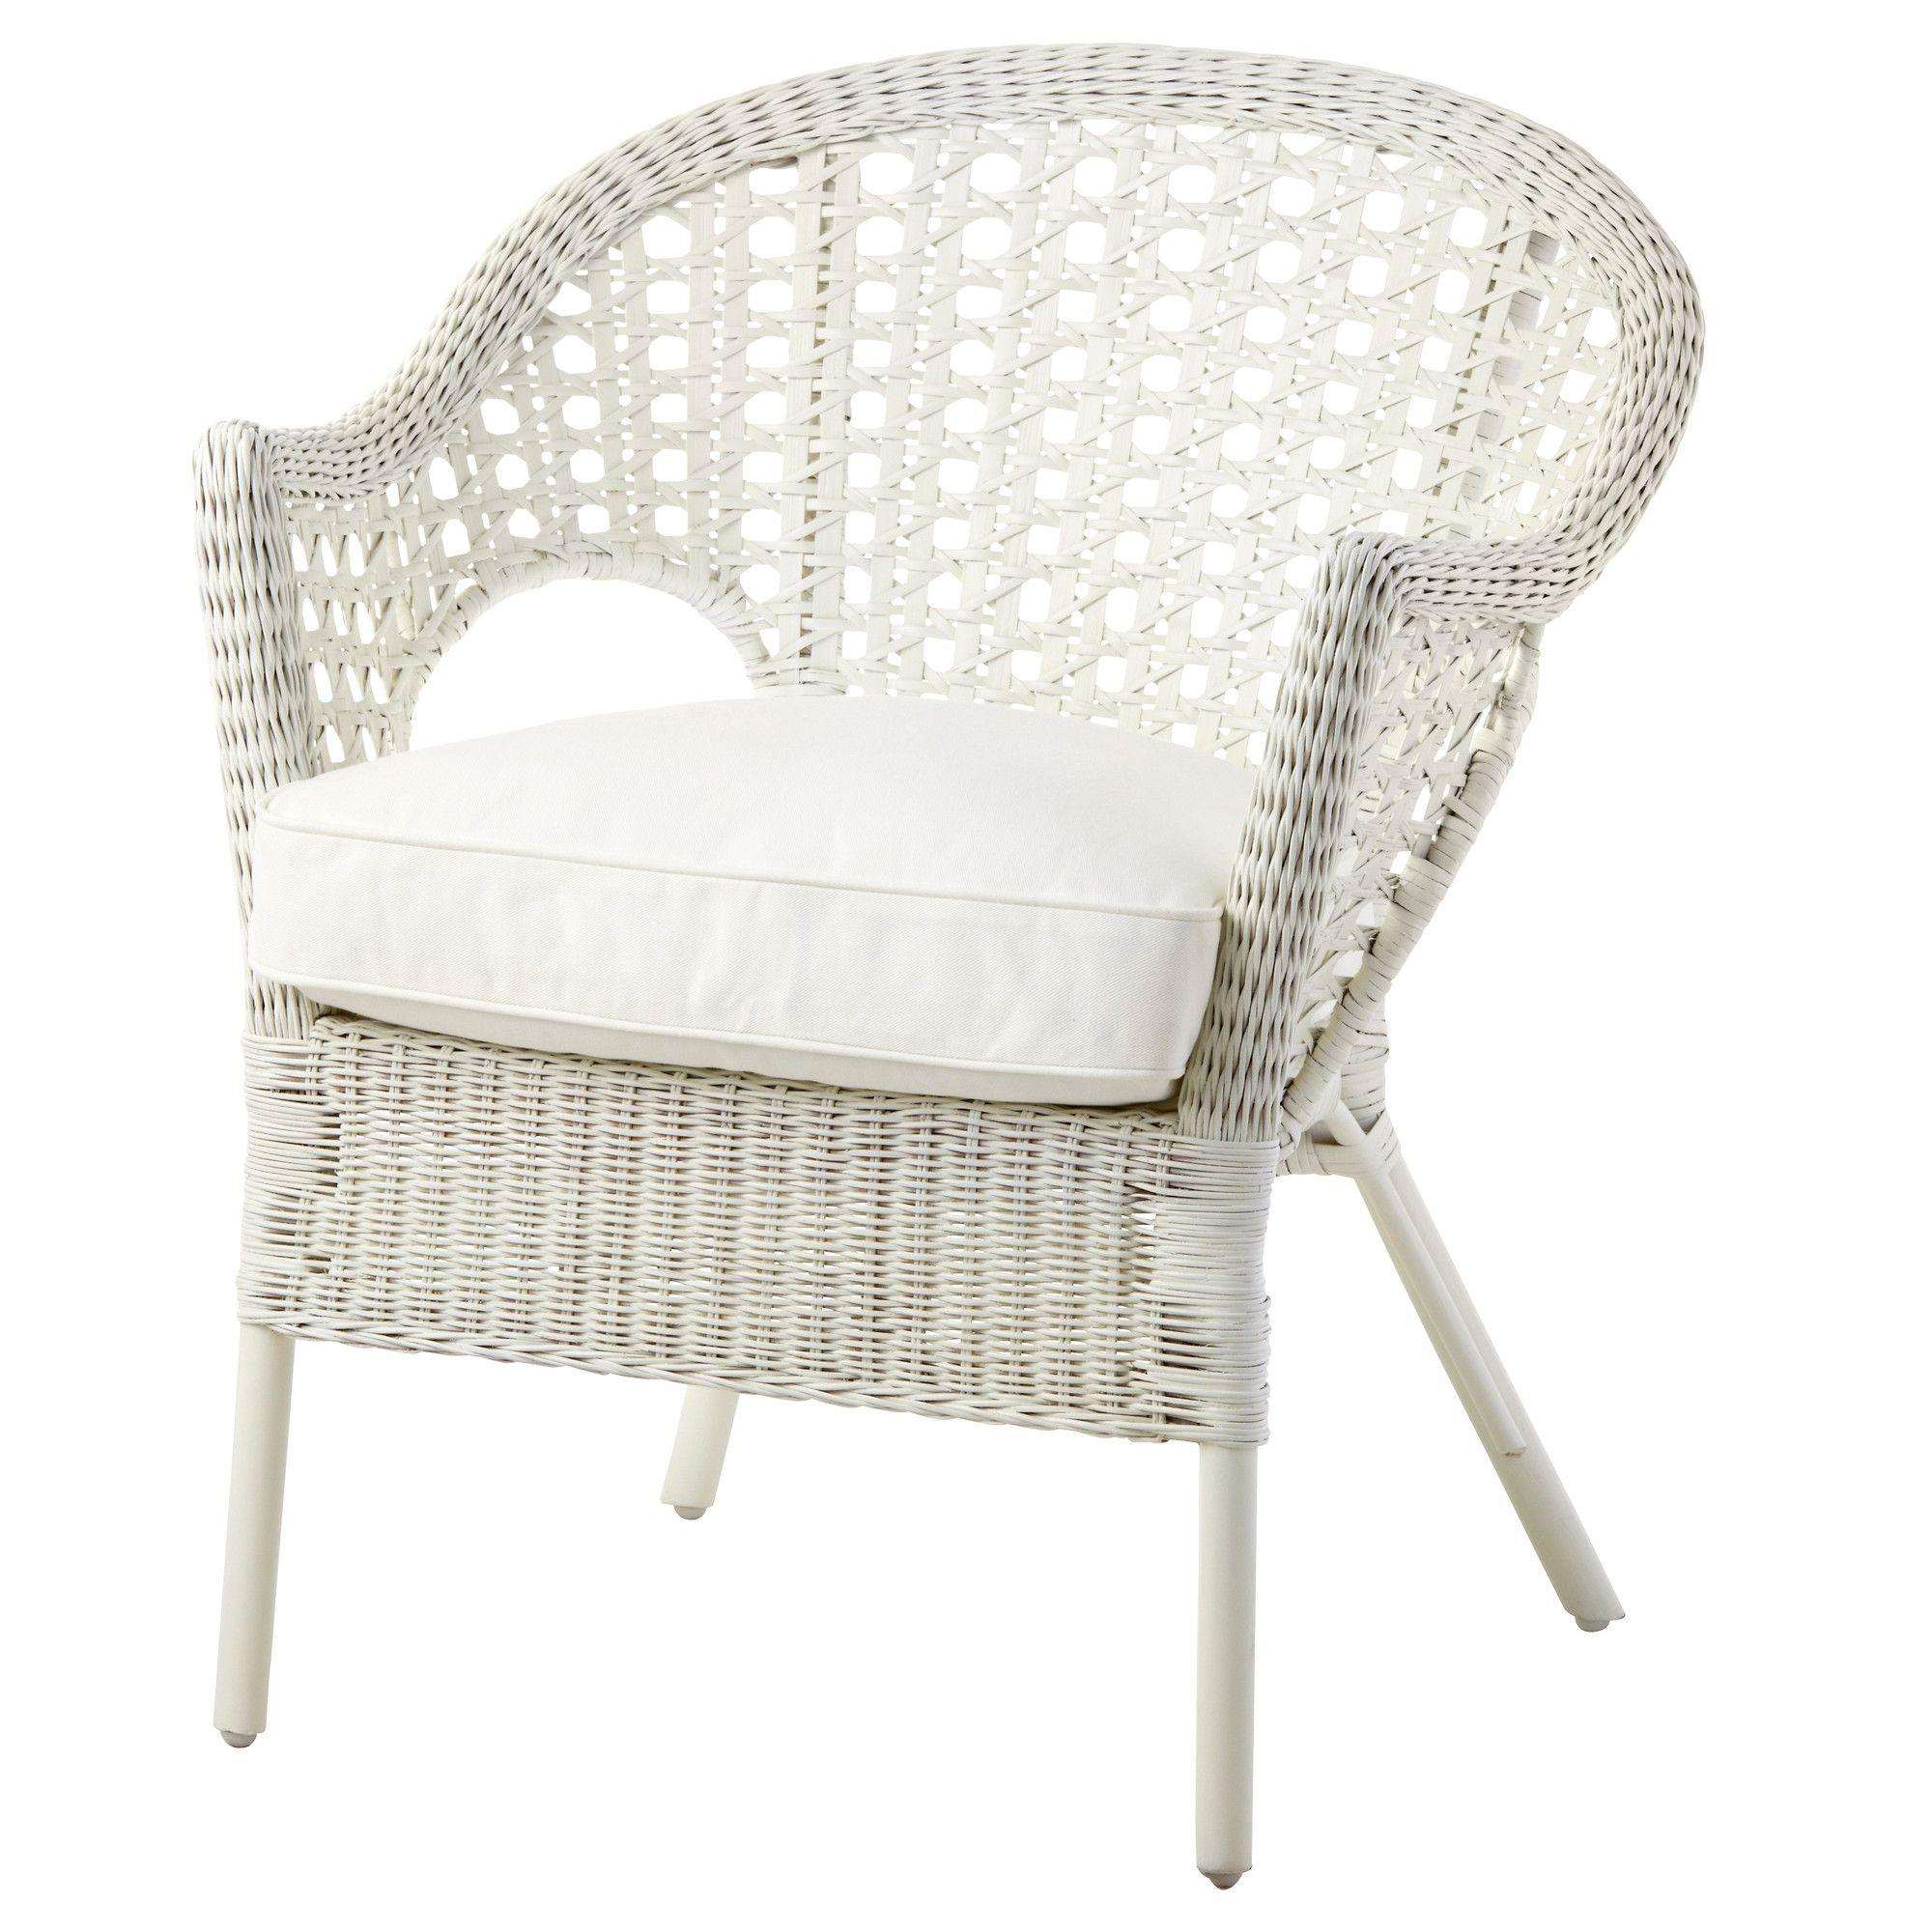 finntorp djupvik armchair with cushion ikea - White Wicker Chair